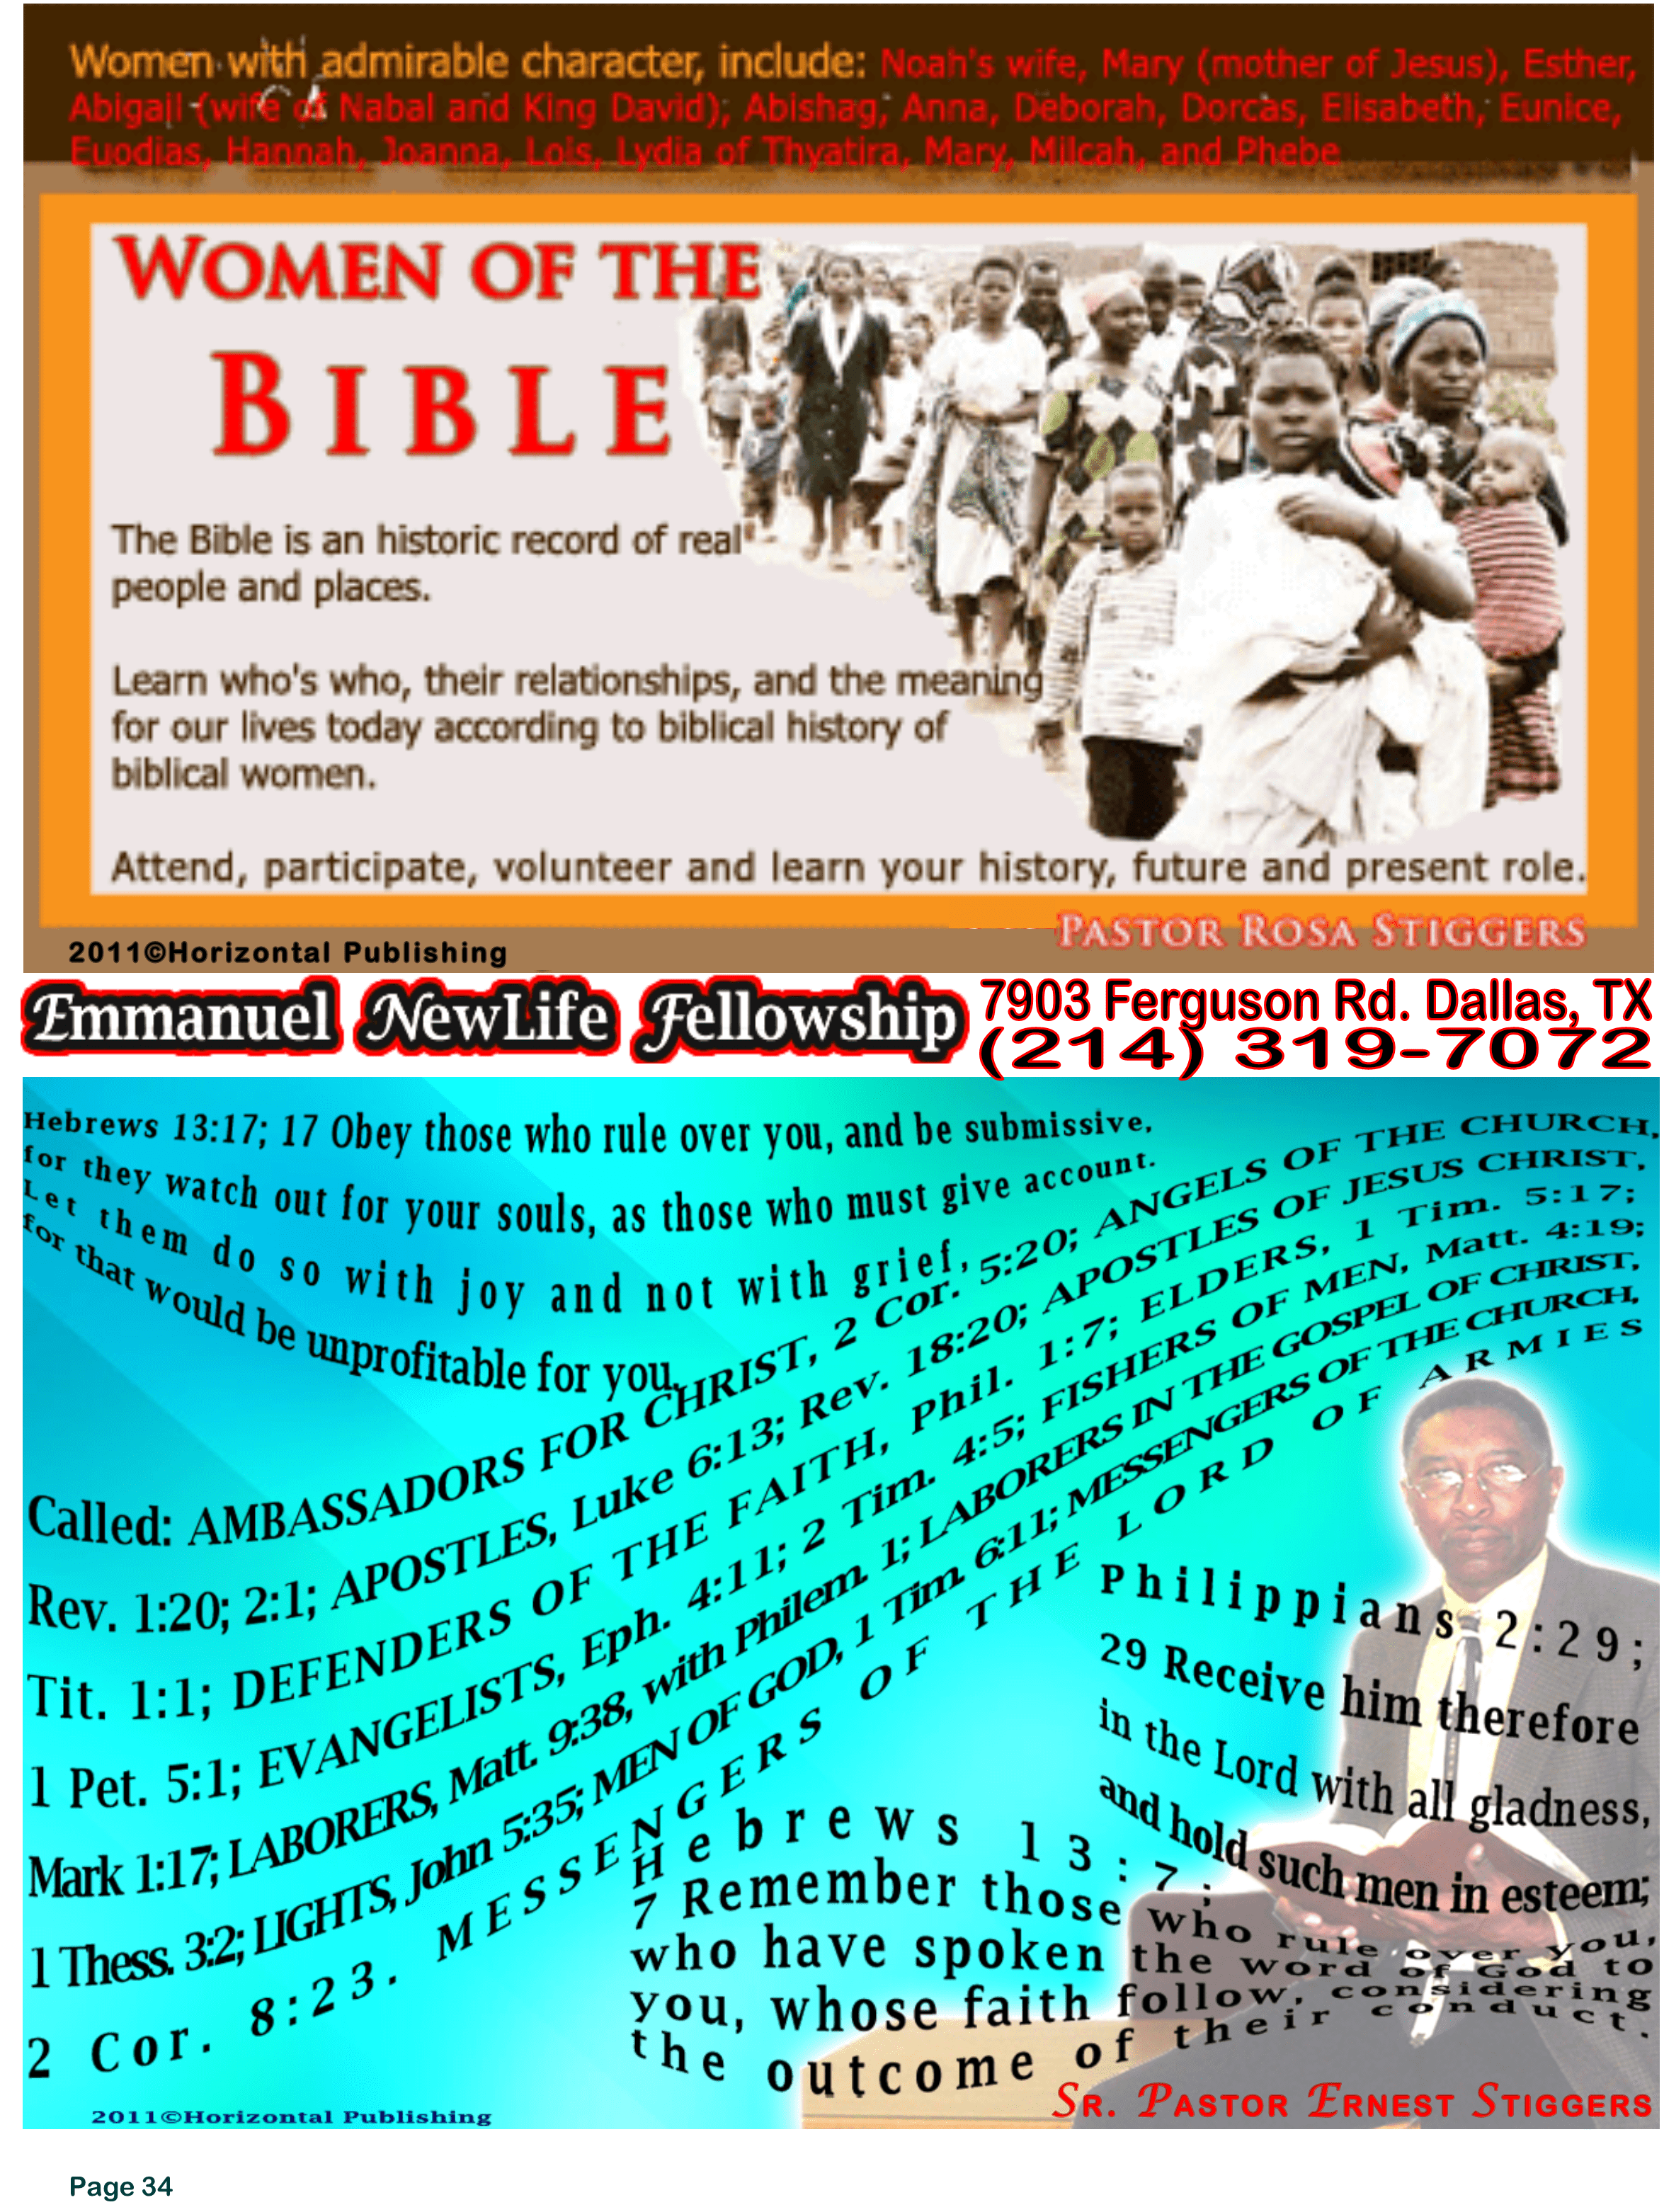 women-of-the-bible-pastor-rosa-stiggers